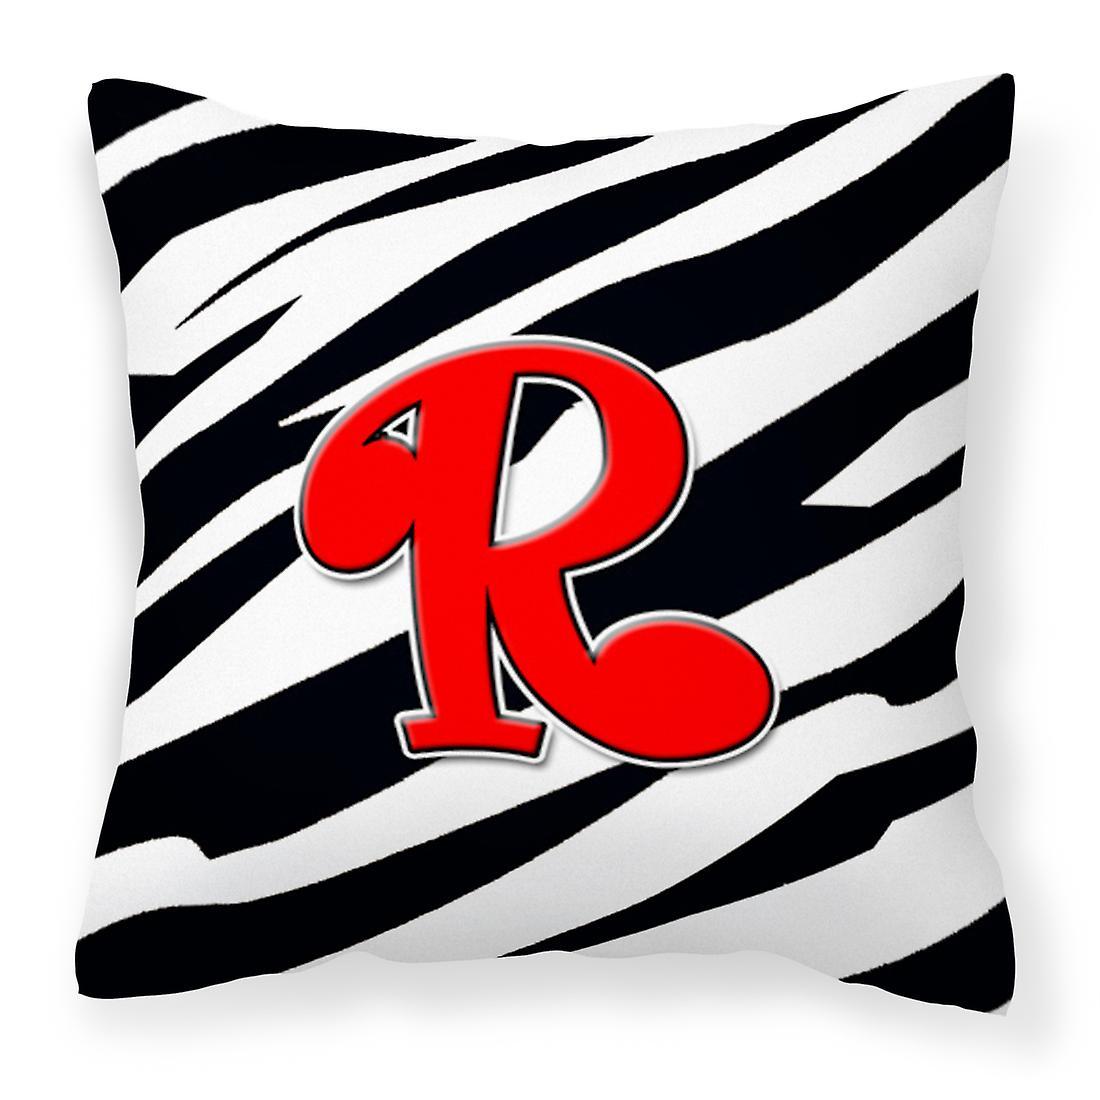 Rouge Tissu Toile Initiale Cj1024 Monogramme Zebra Décorative Oreiller R DIYW9HEe2